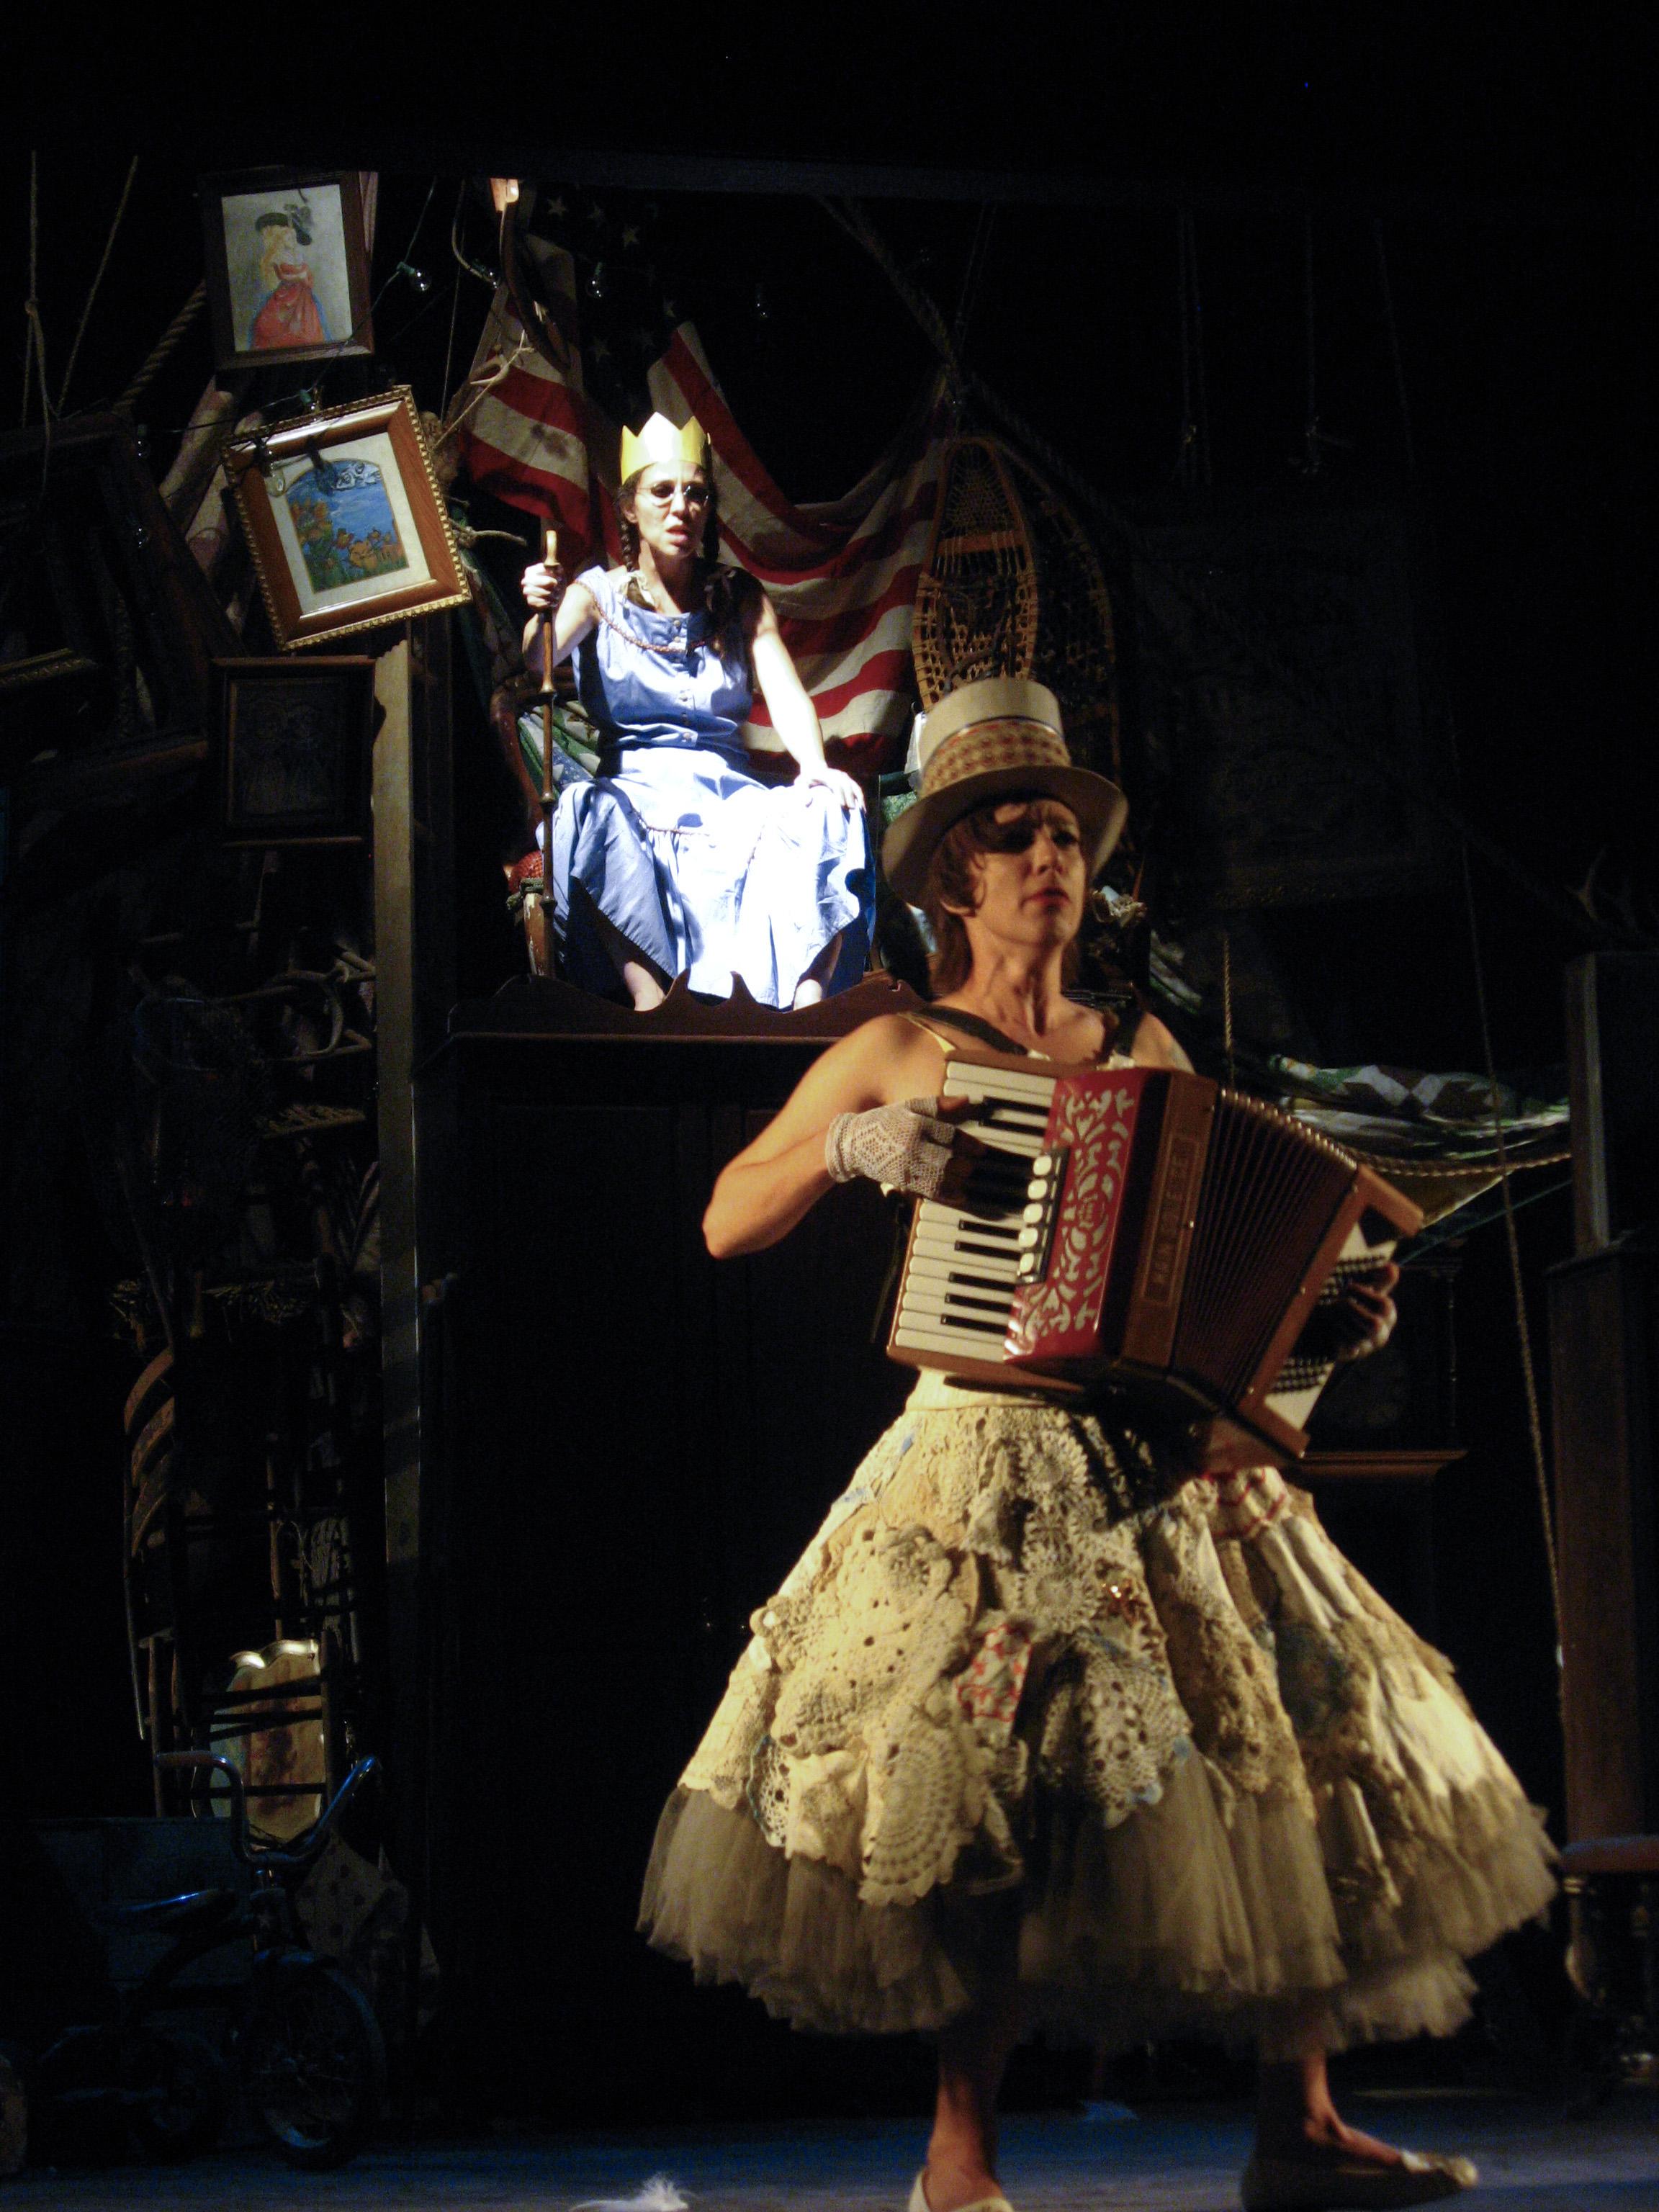 1 American Fairytales Fairy_1.jpg